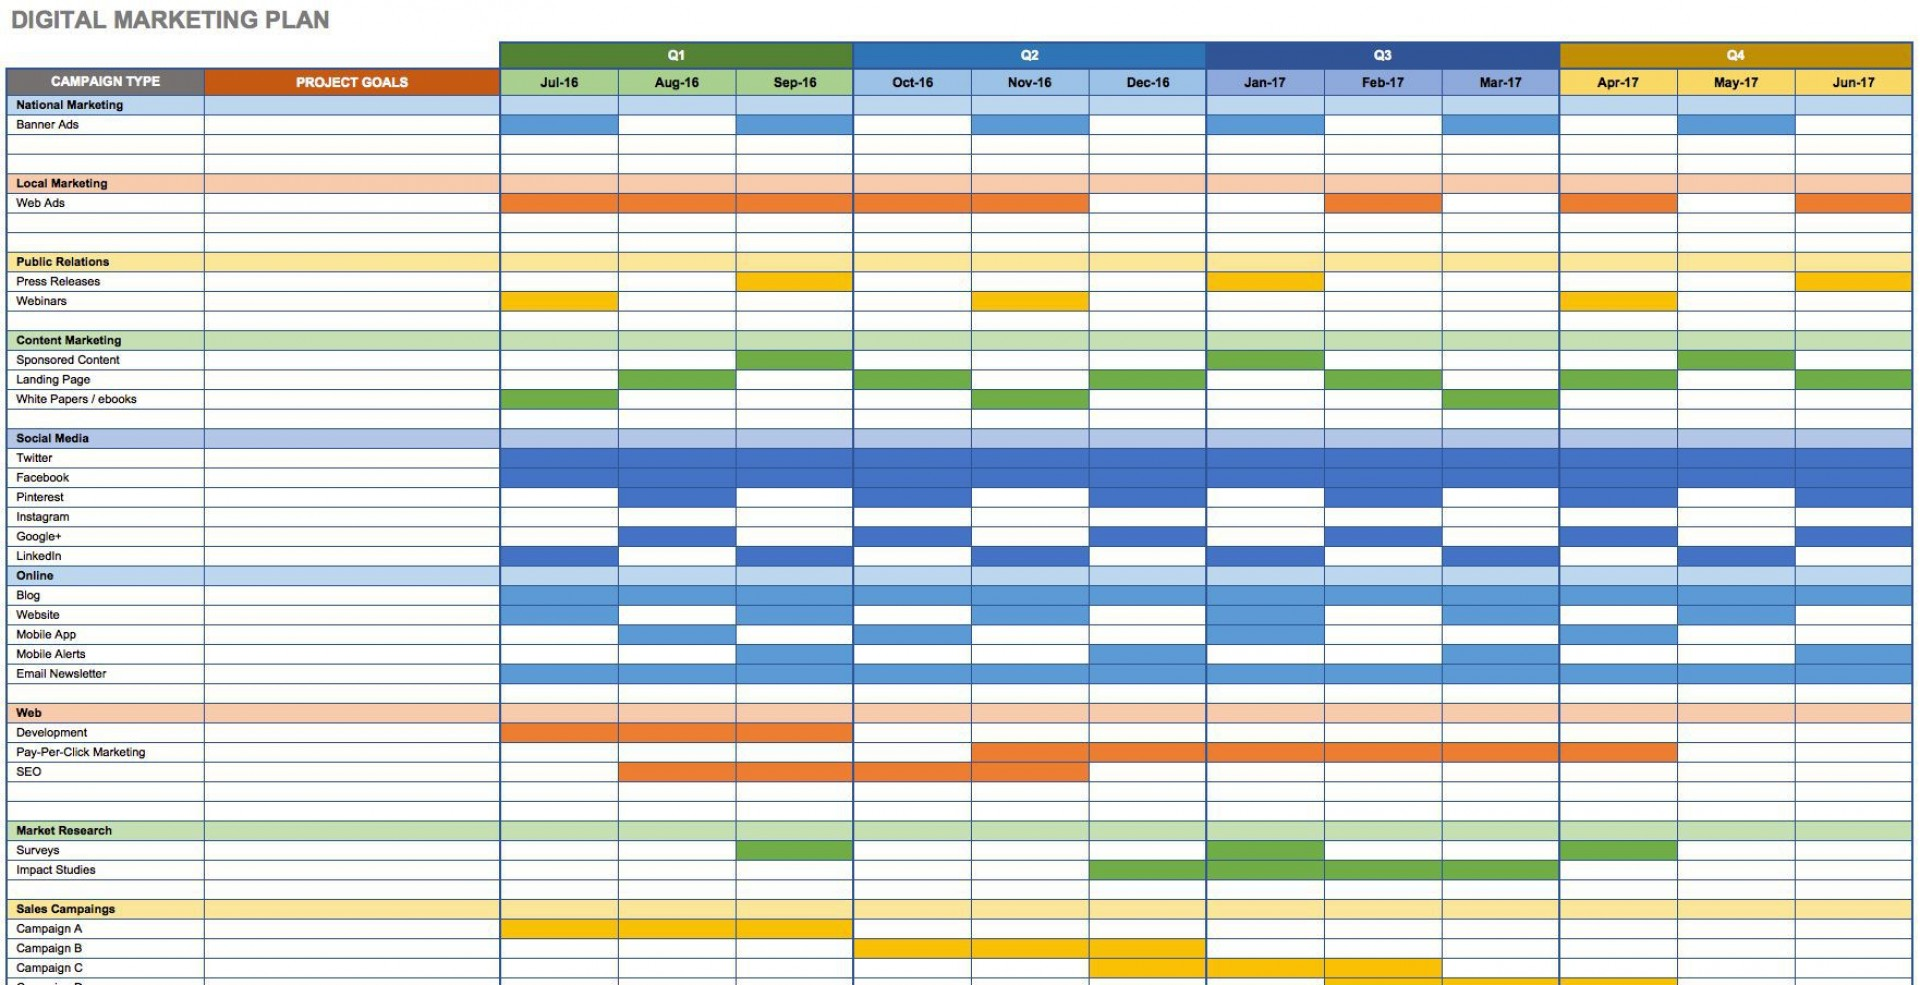 004 Fantastic Digital Marketing Busines Plan Example High Resolution  Template Free Sample Pdf1920